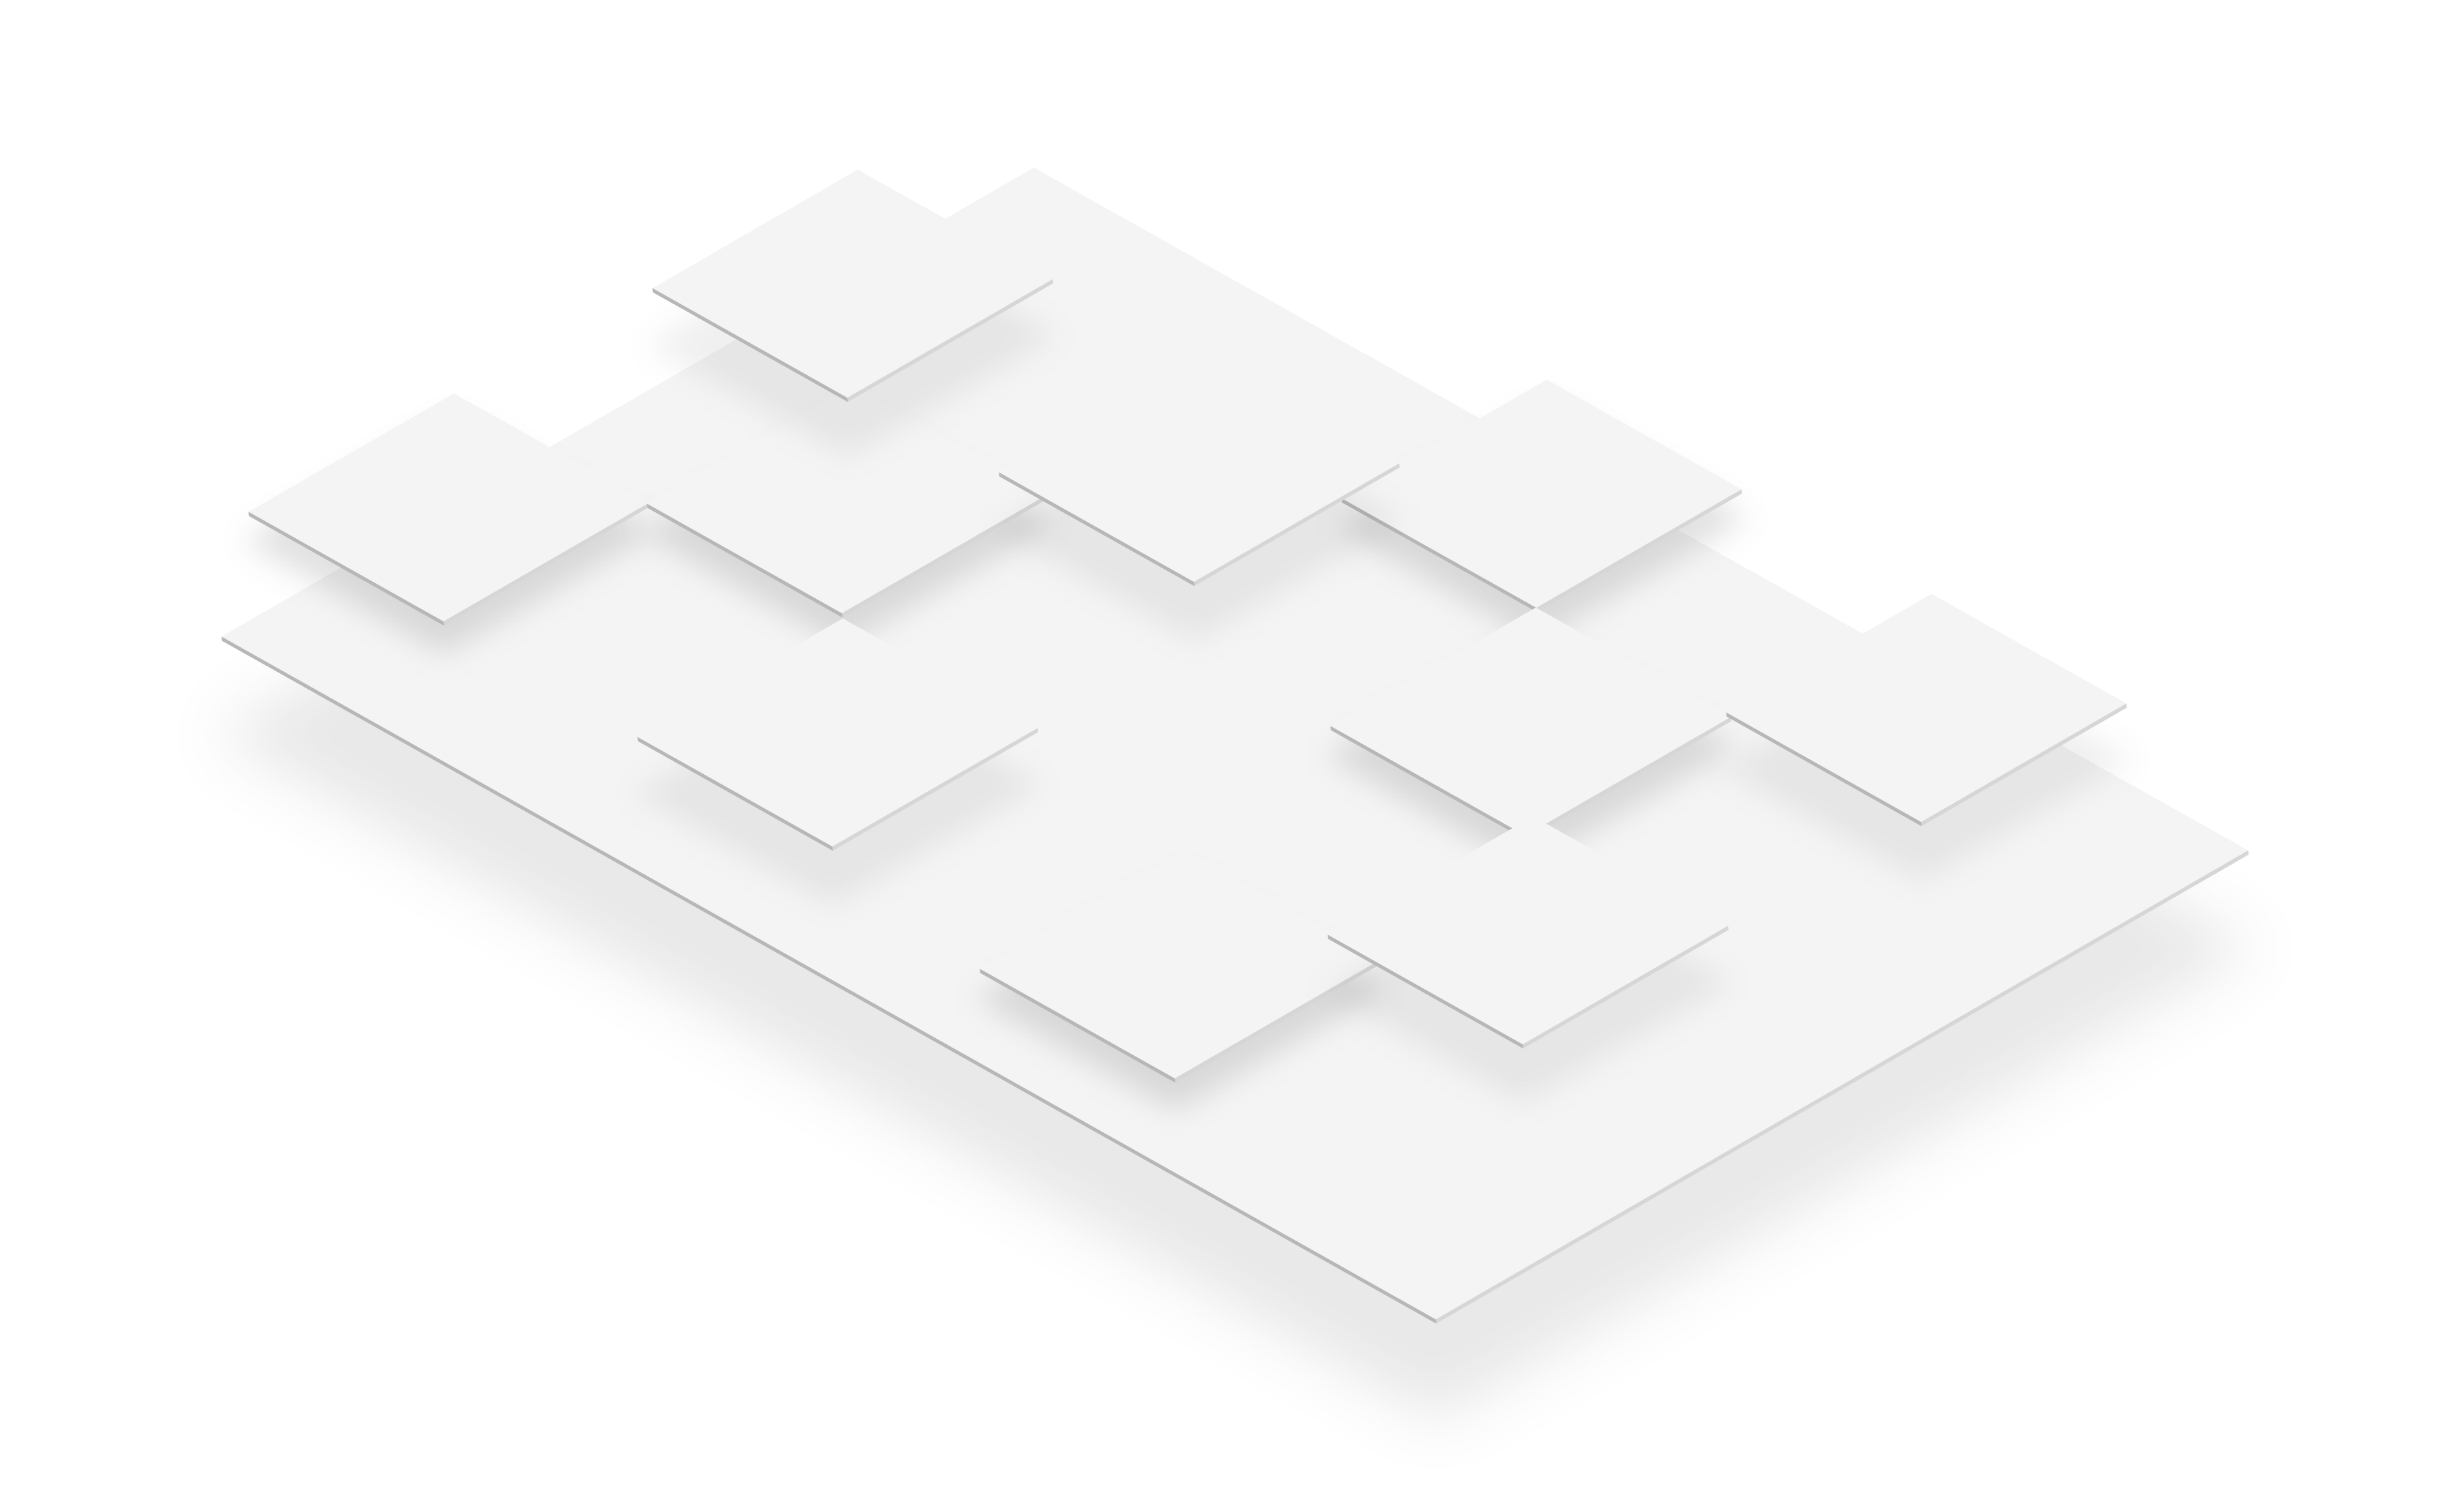 abstract digitalisation